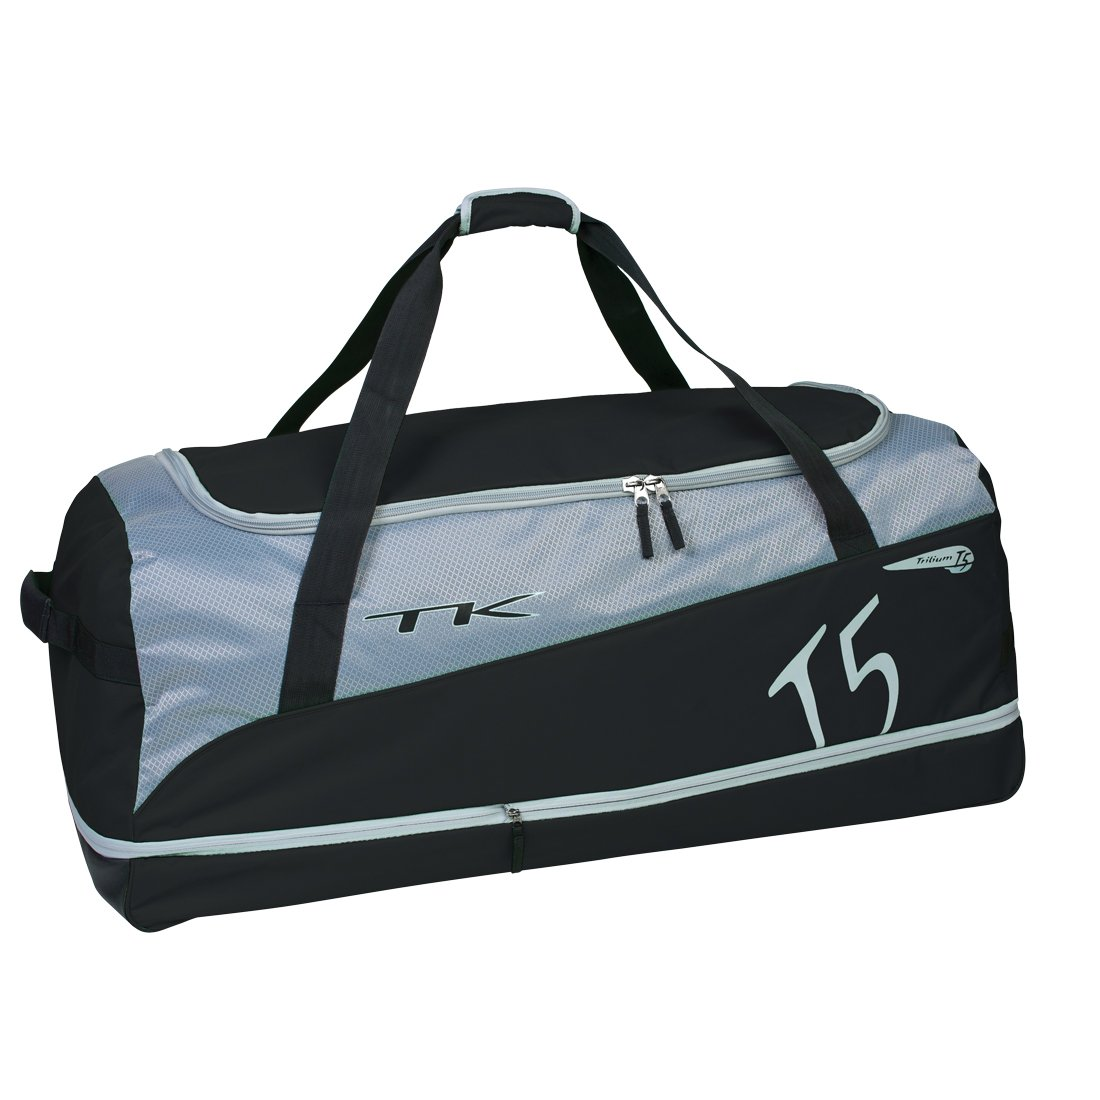 TK Trilium 5 Field Hockey Goalkeeper Bag